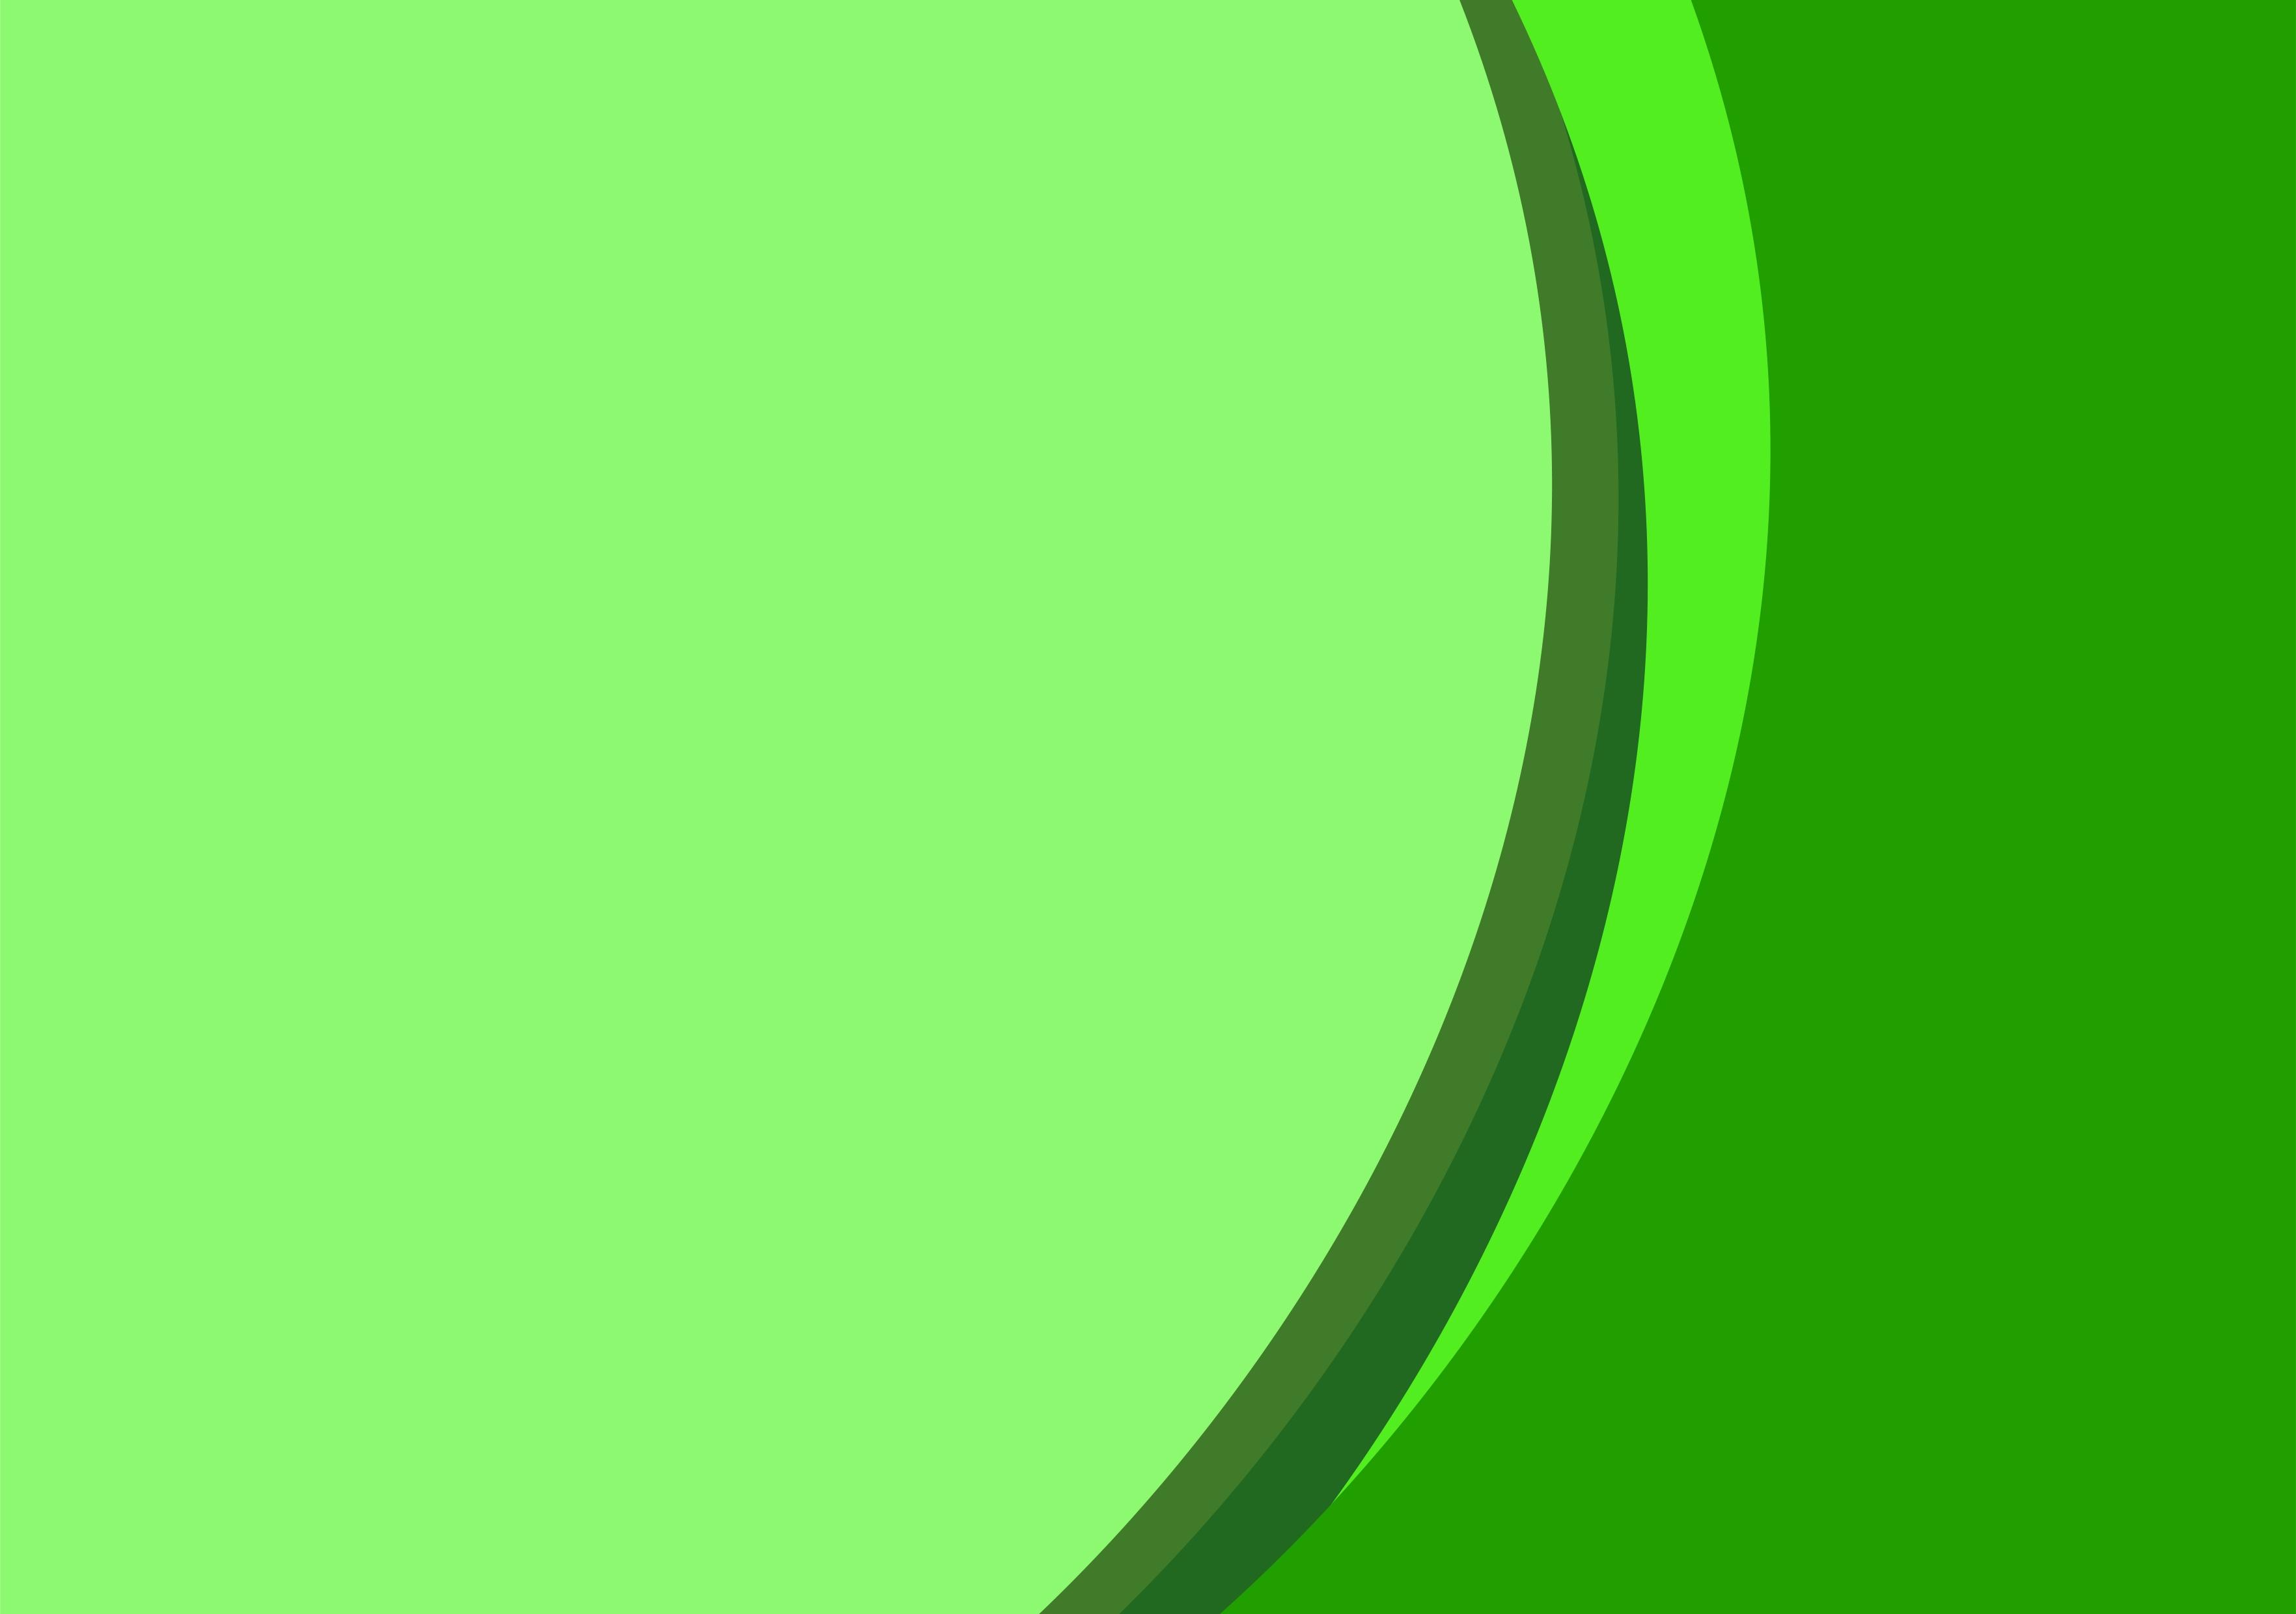 Download 77 Koleksi Background Hijau Muda Polos Hd Terbaik